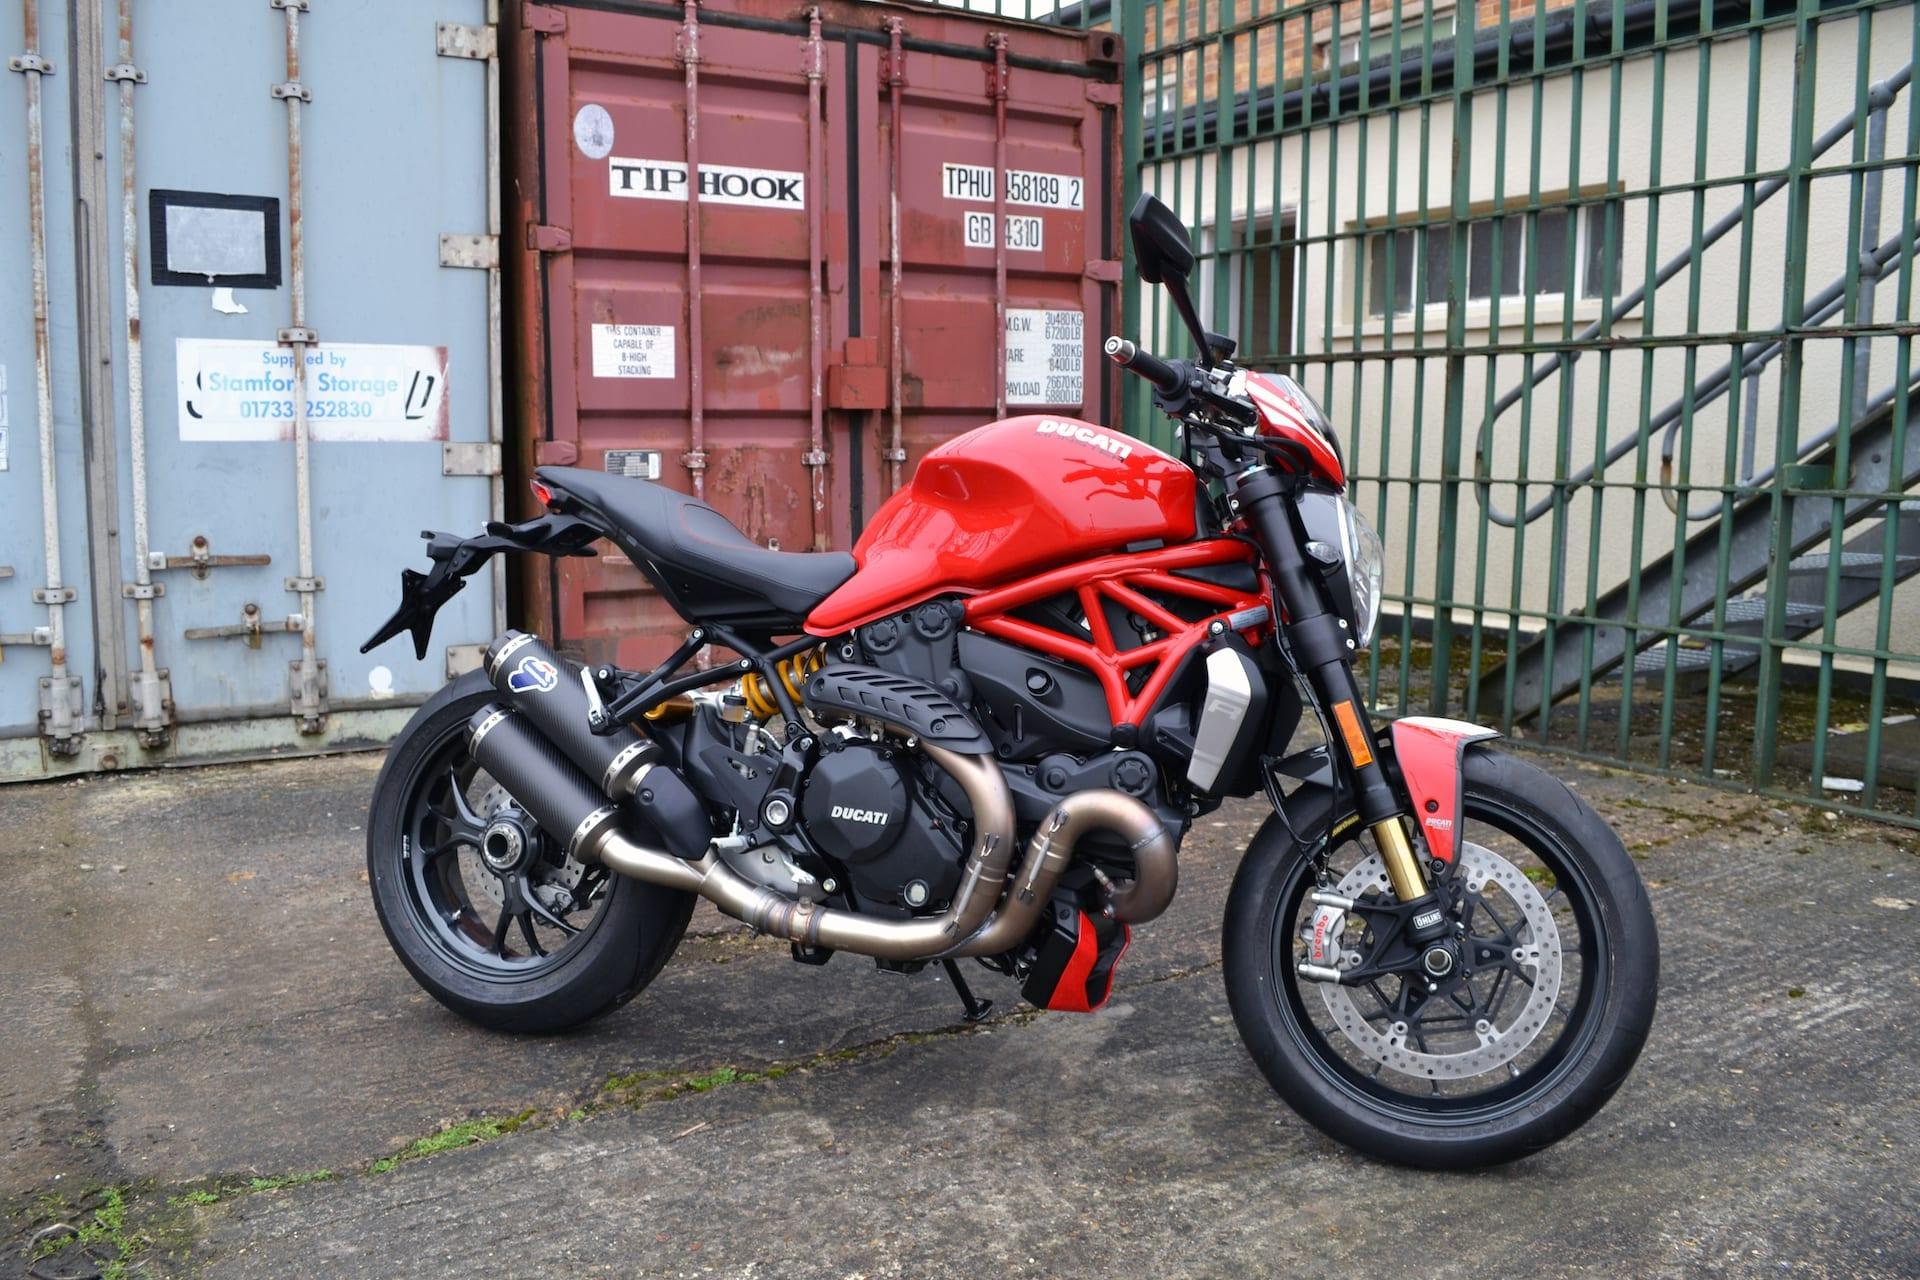 Tex Design Ducati Monster S4R   Return of the Cafe Racers